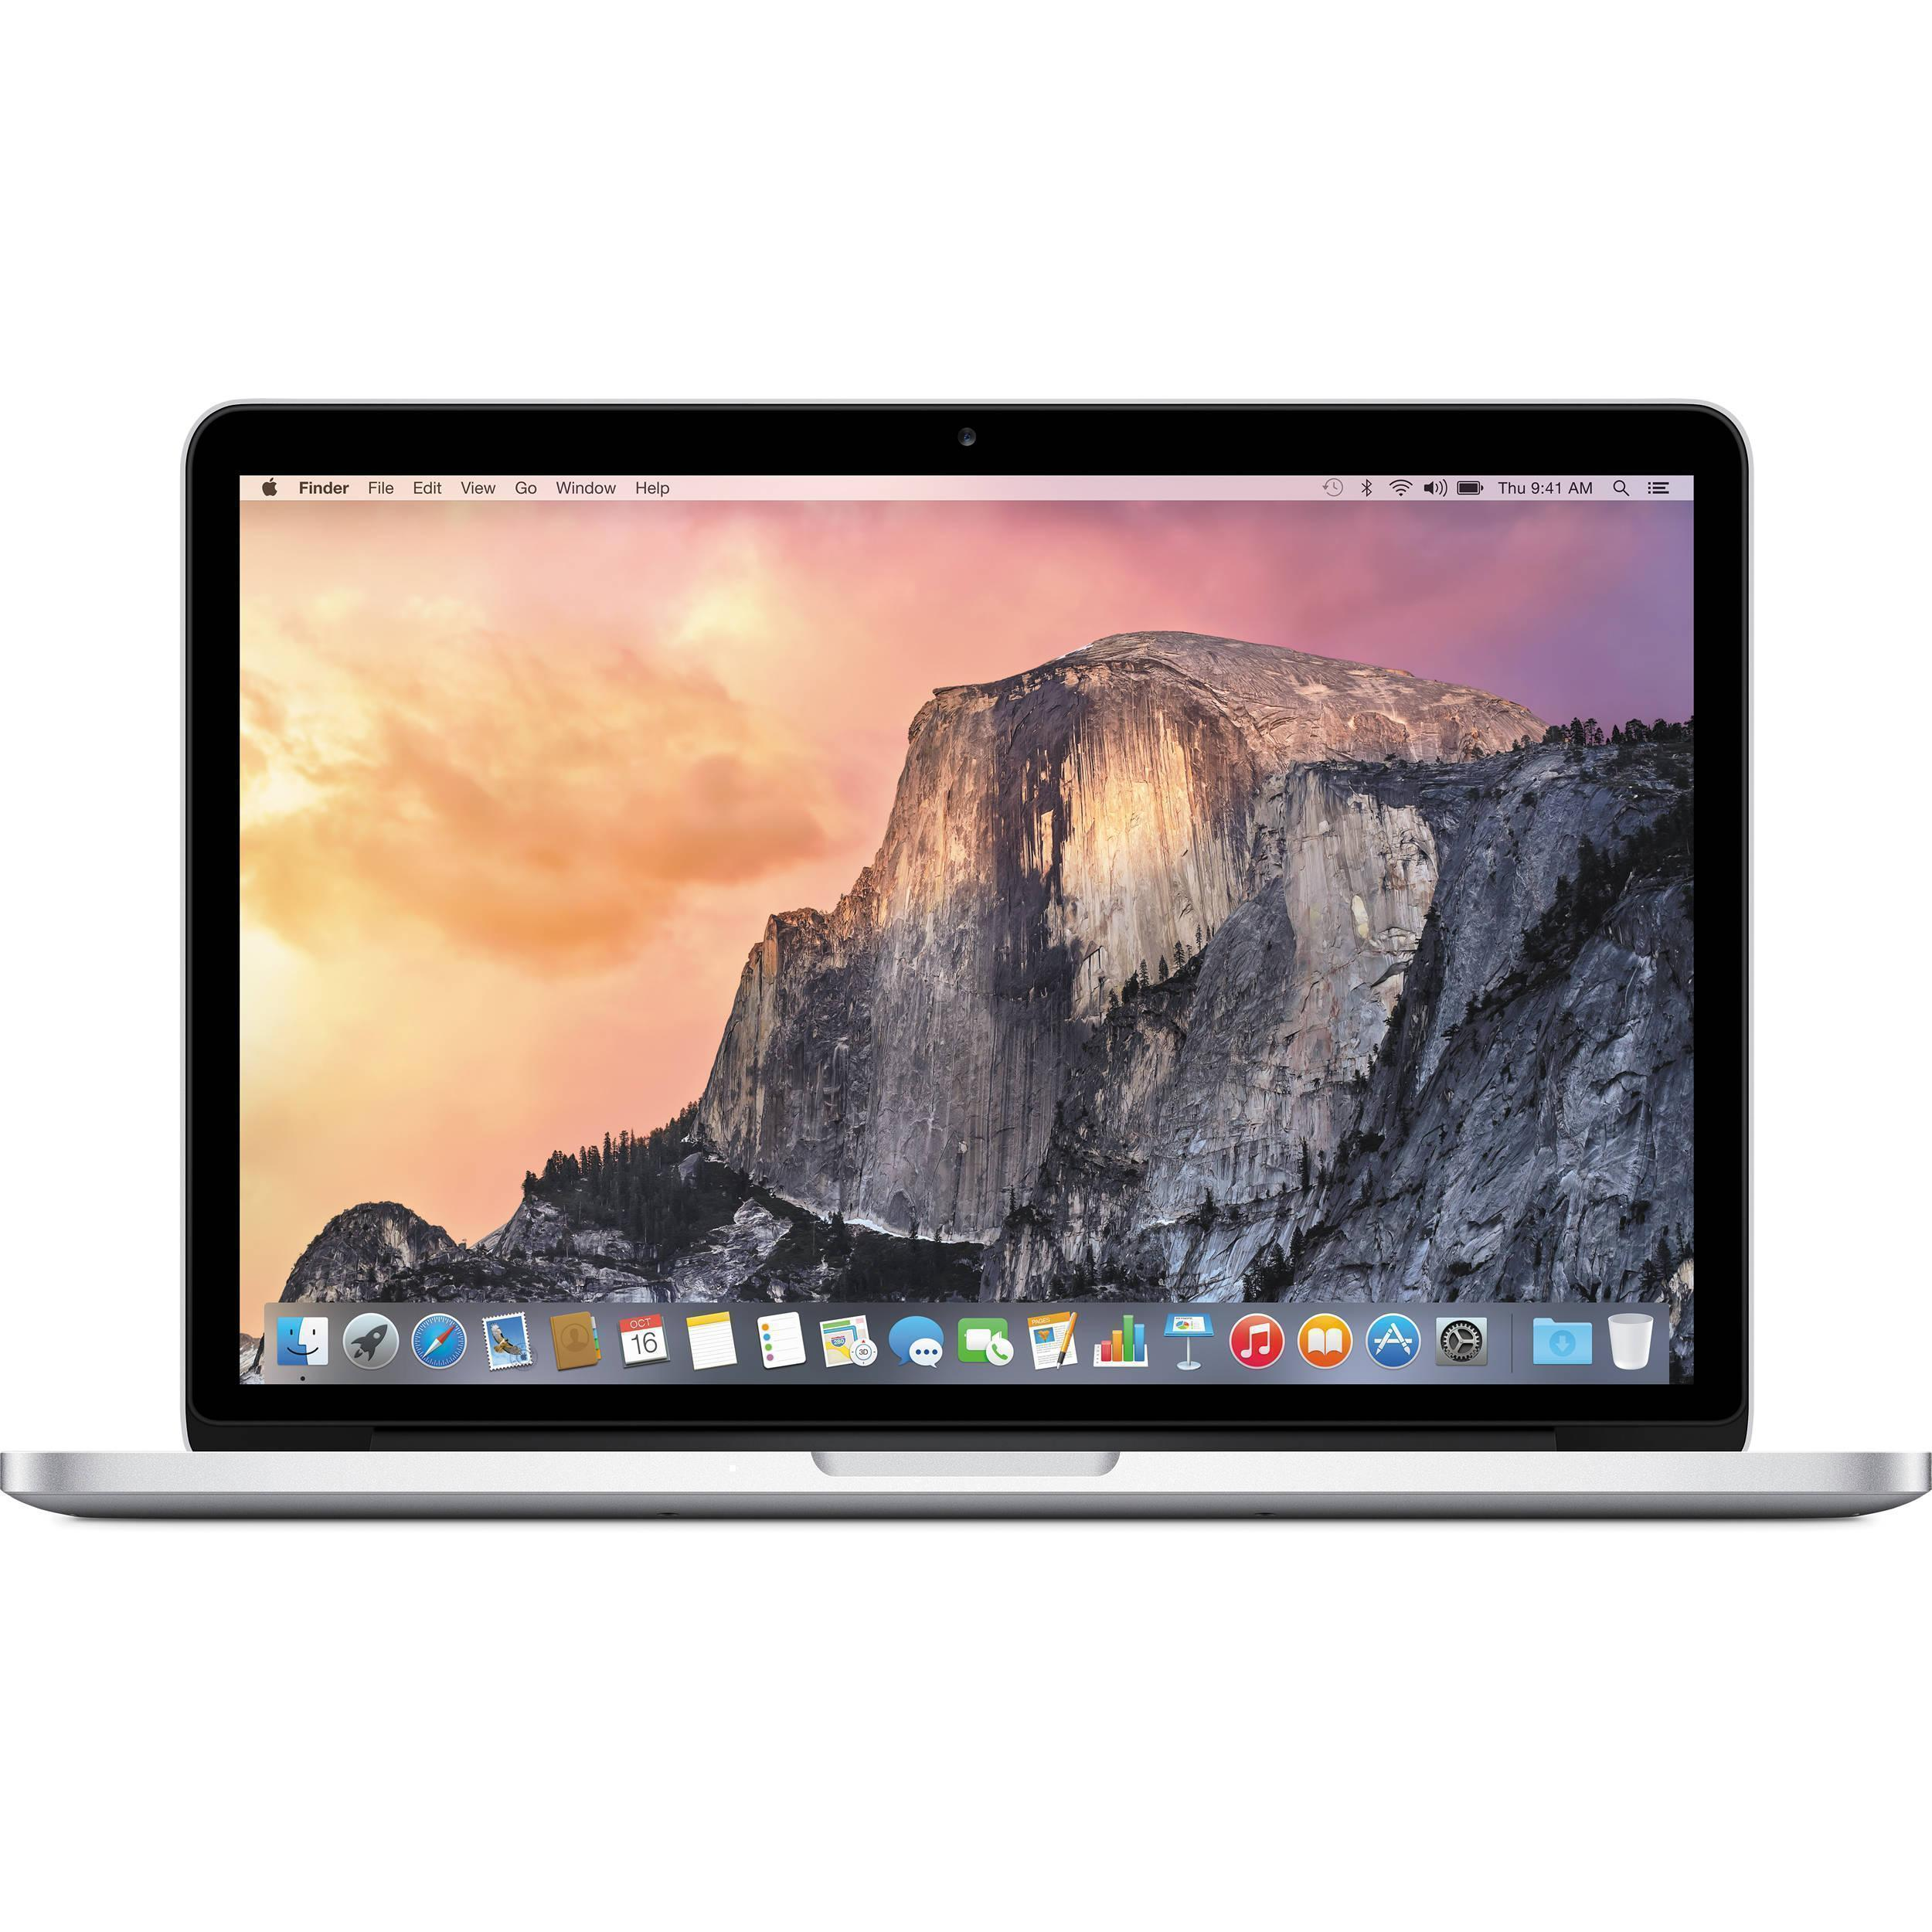 "MacBook Pro Retina 13,3"" (2013) - Core i5 - 8GB - SSD 250 GB QWERTY - Anglická (US)"